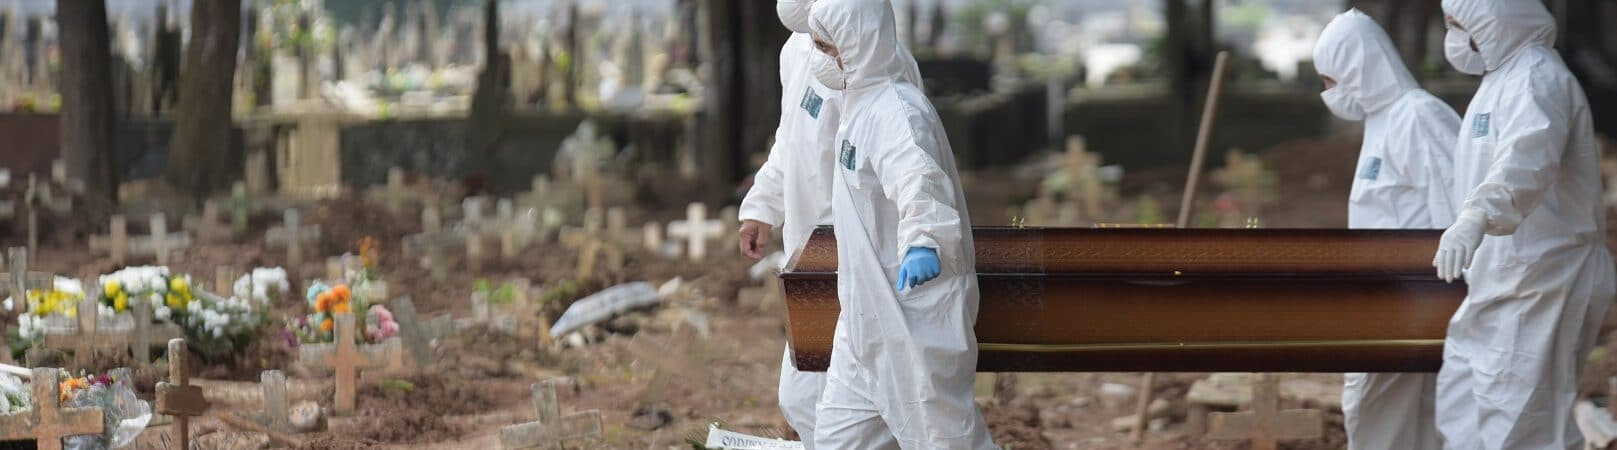 Covid-19 coronavírus pandemia mortes